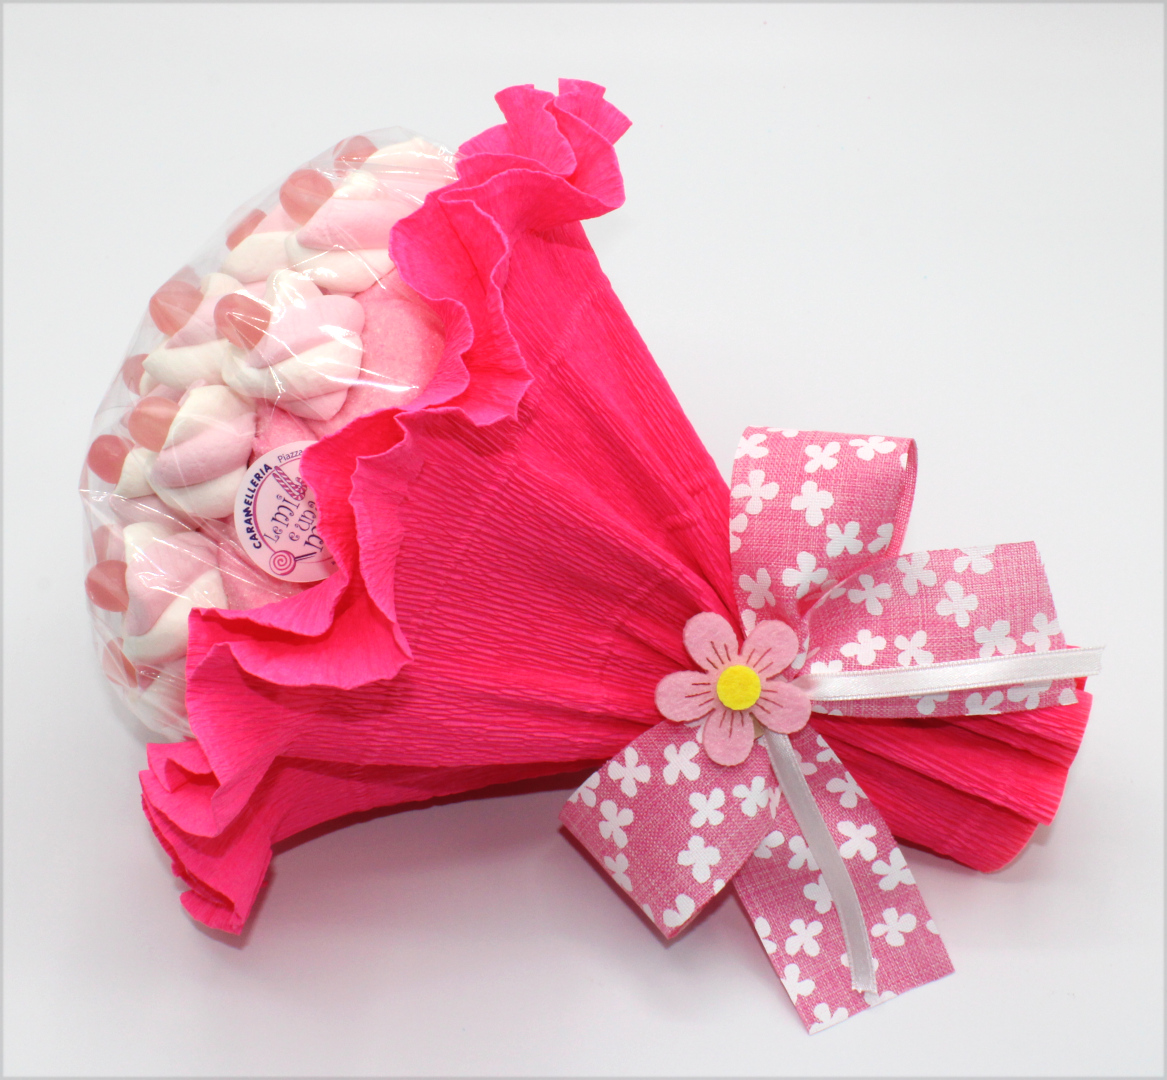 bouquet marshmallow caramelle gommose vendita online